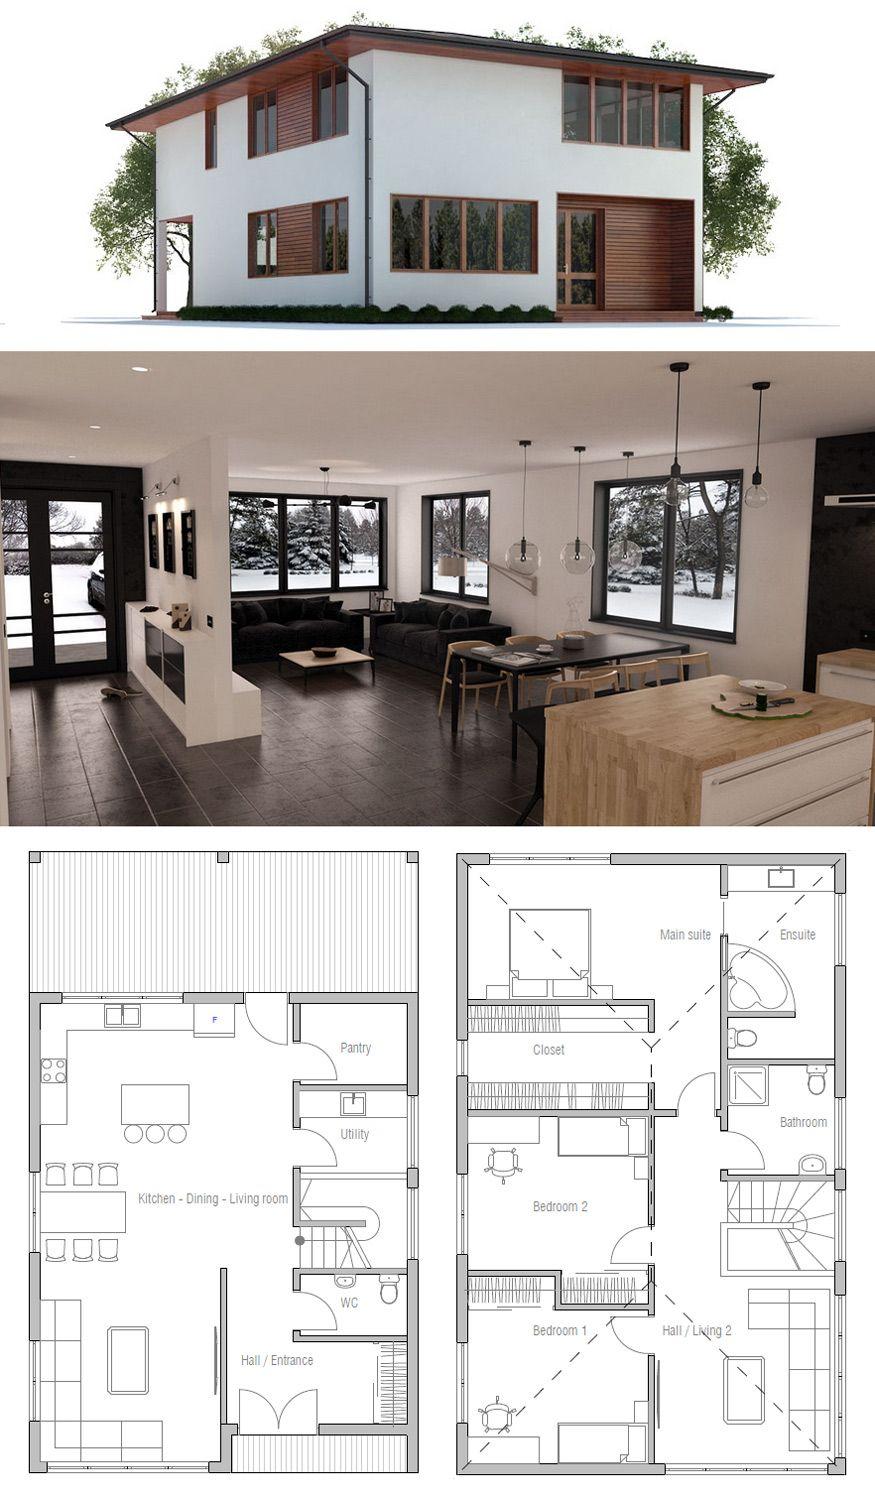 Ensuite badezimmerdesignpläne plan de maison petite maison  hauspläne  pinterest  haus haus